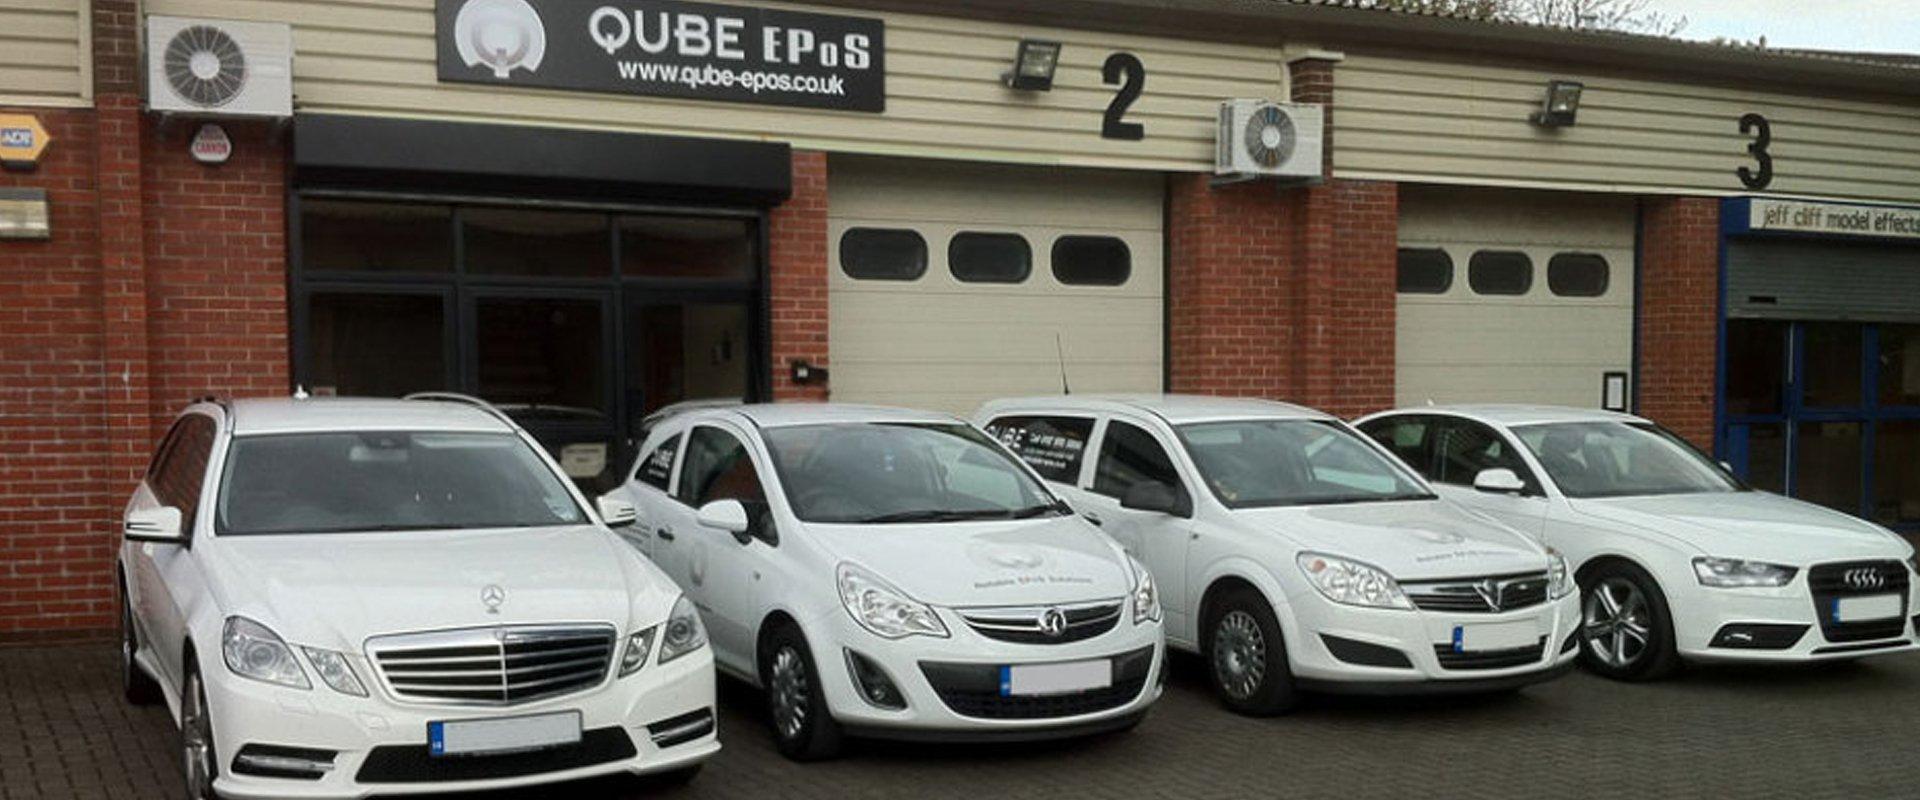 Qube EPoS Ltd office